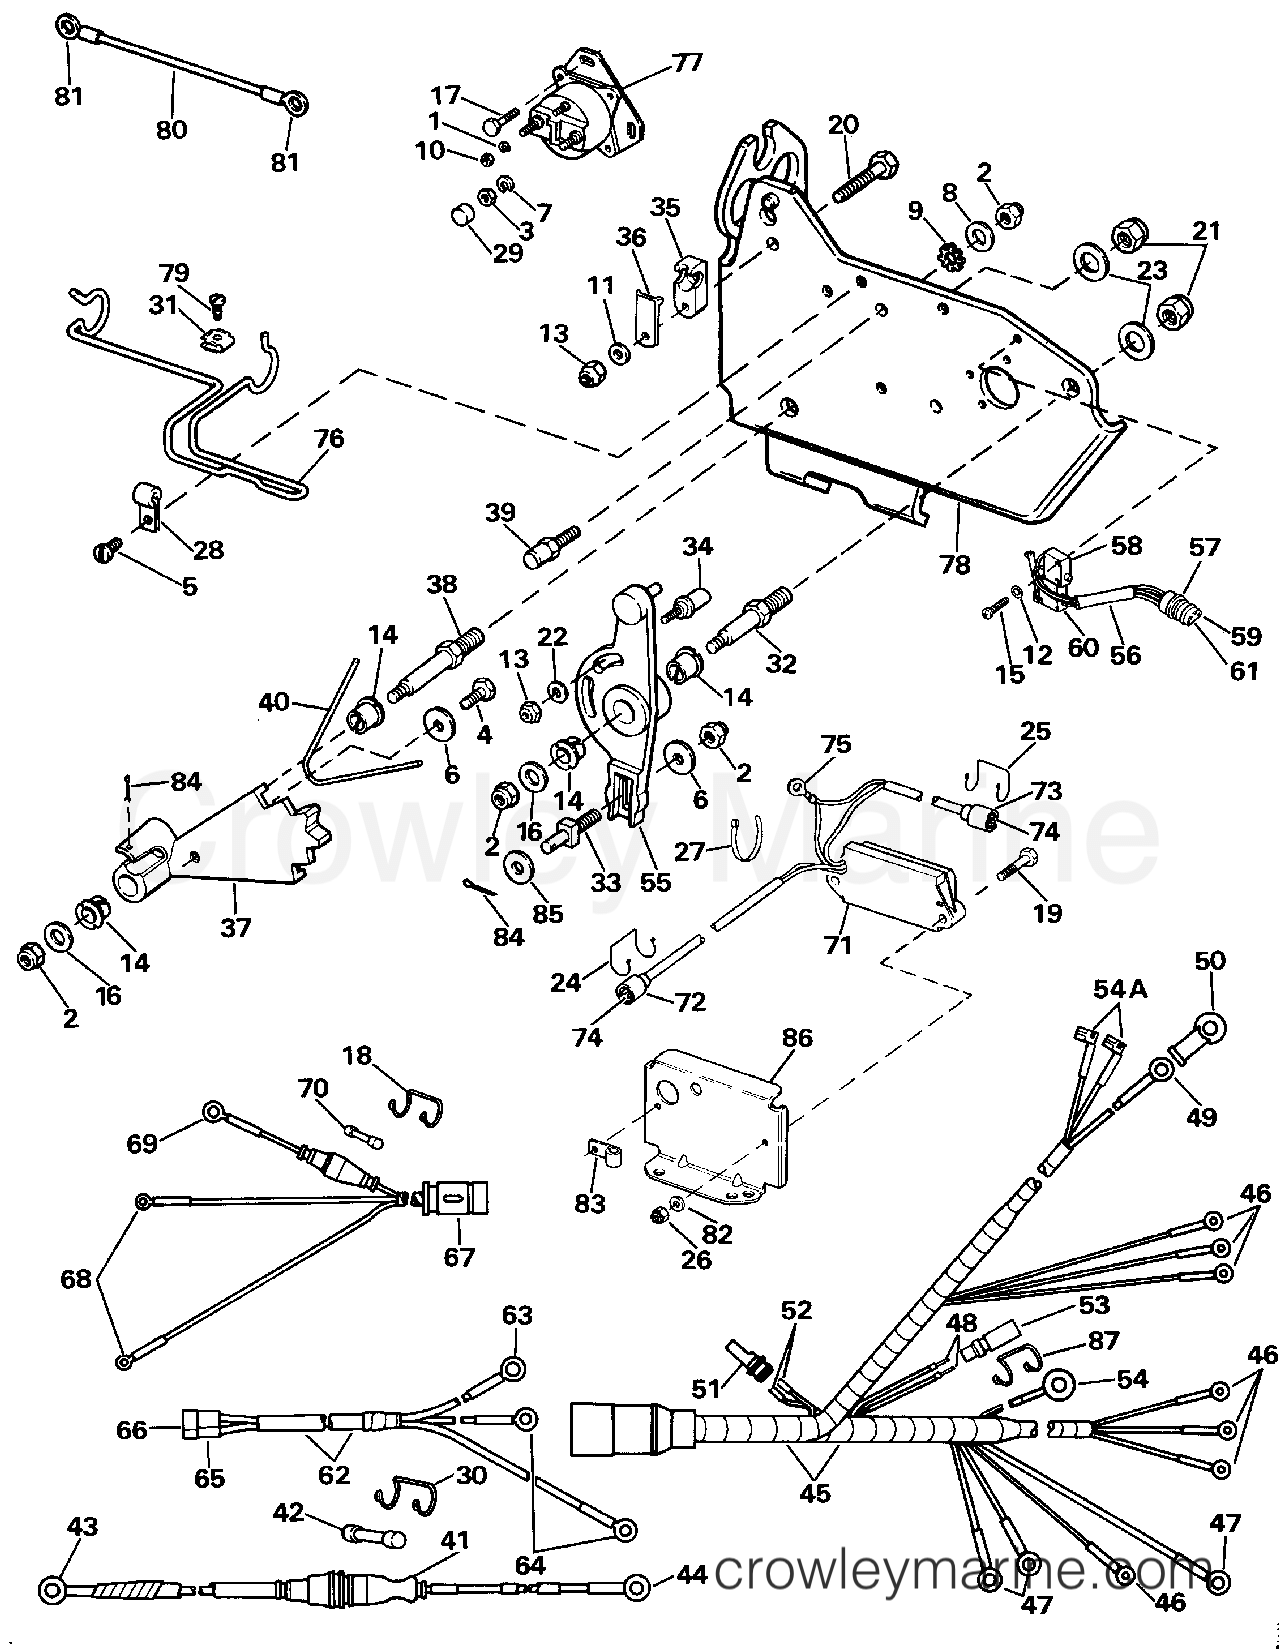 1987 omc wiring diagram